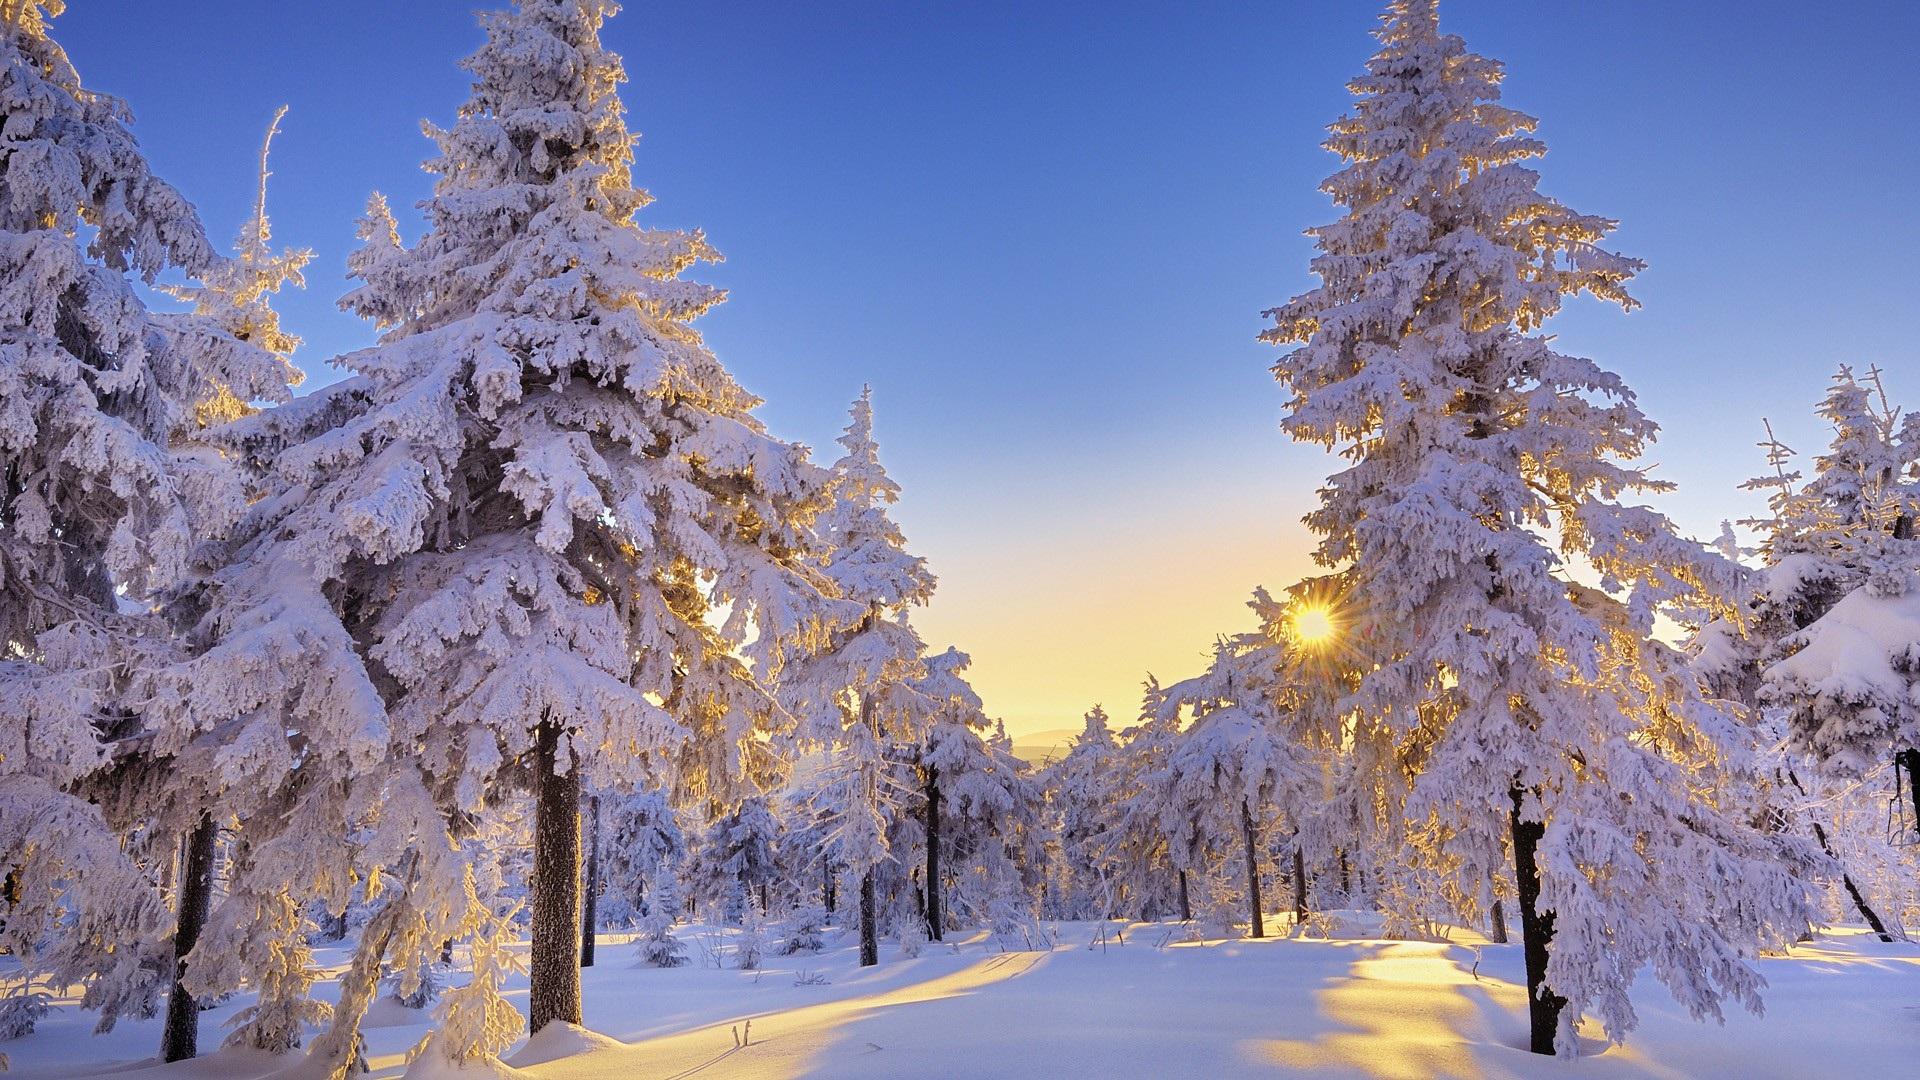 winter backgrounds for desktop pixelstalk collection of free winter